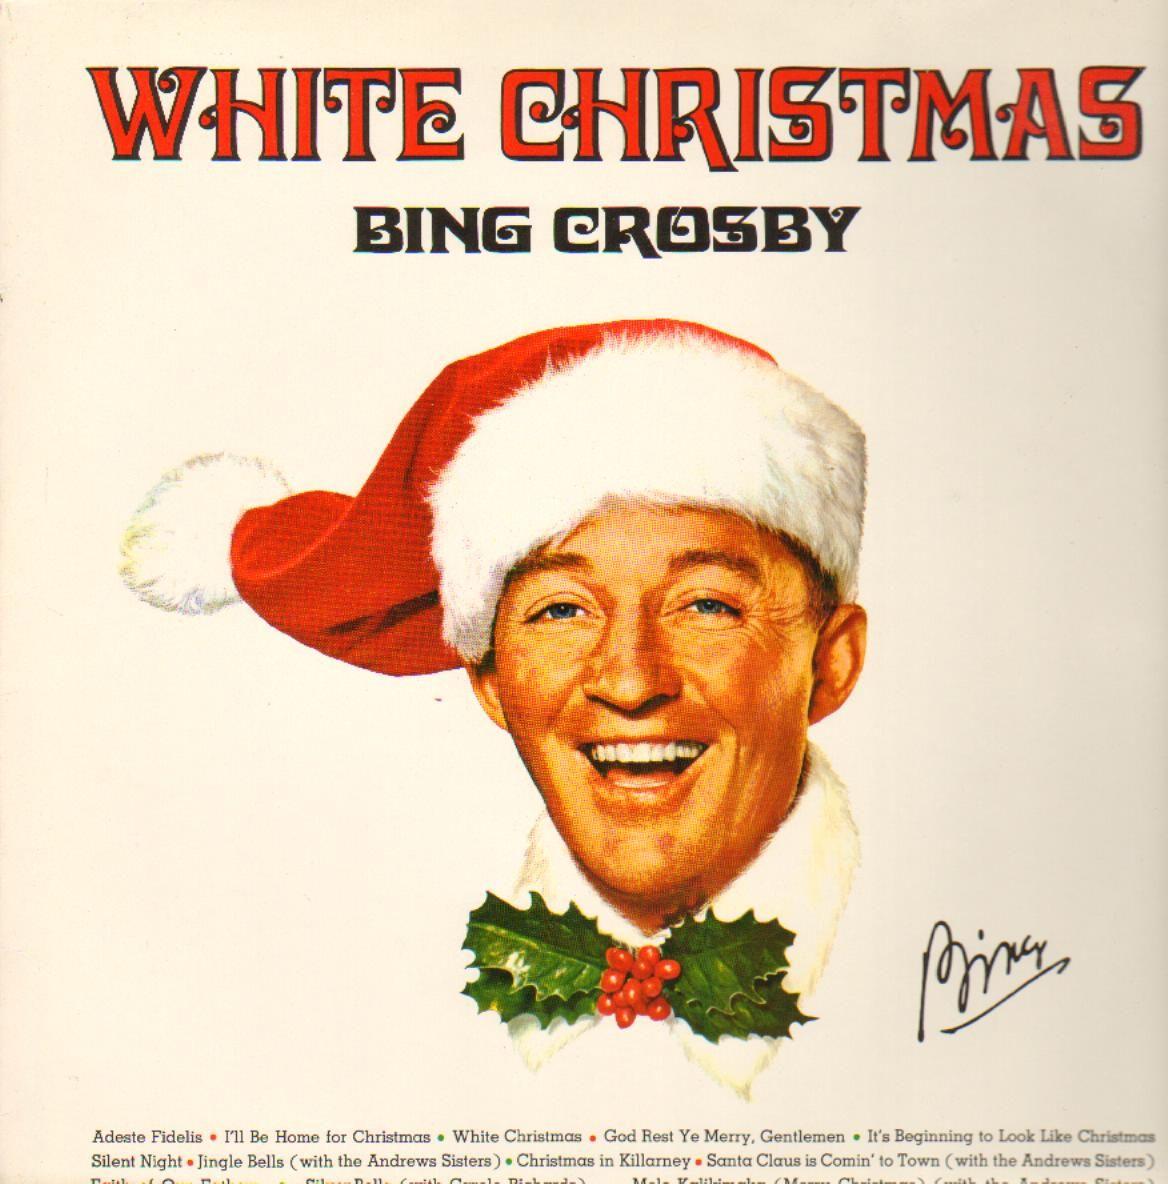 bing_crosby-white_christmas2.jpg